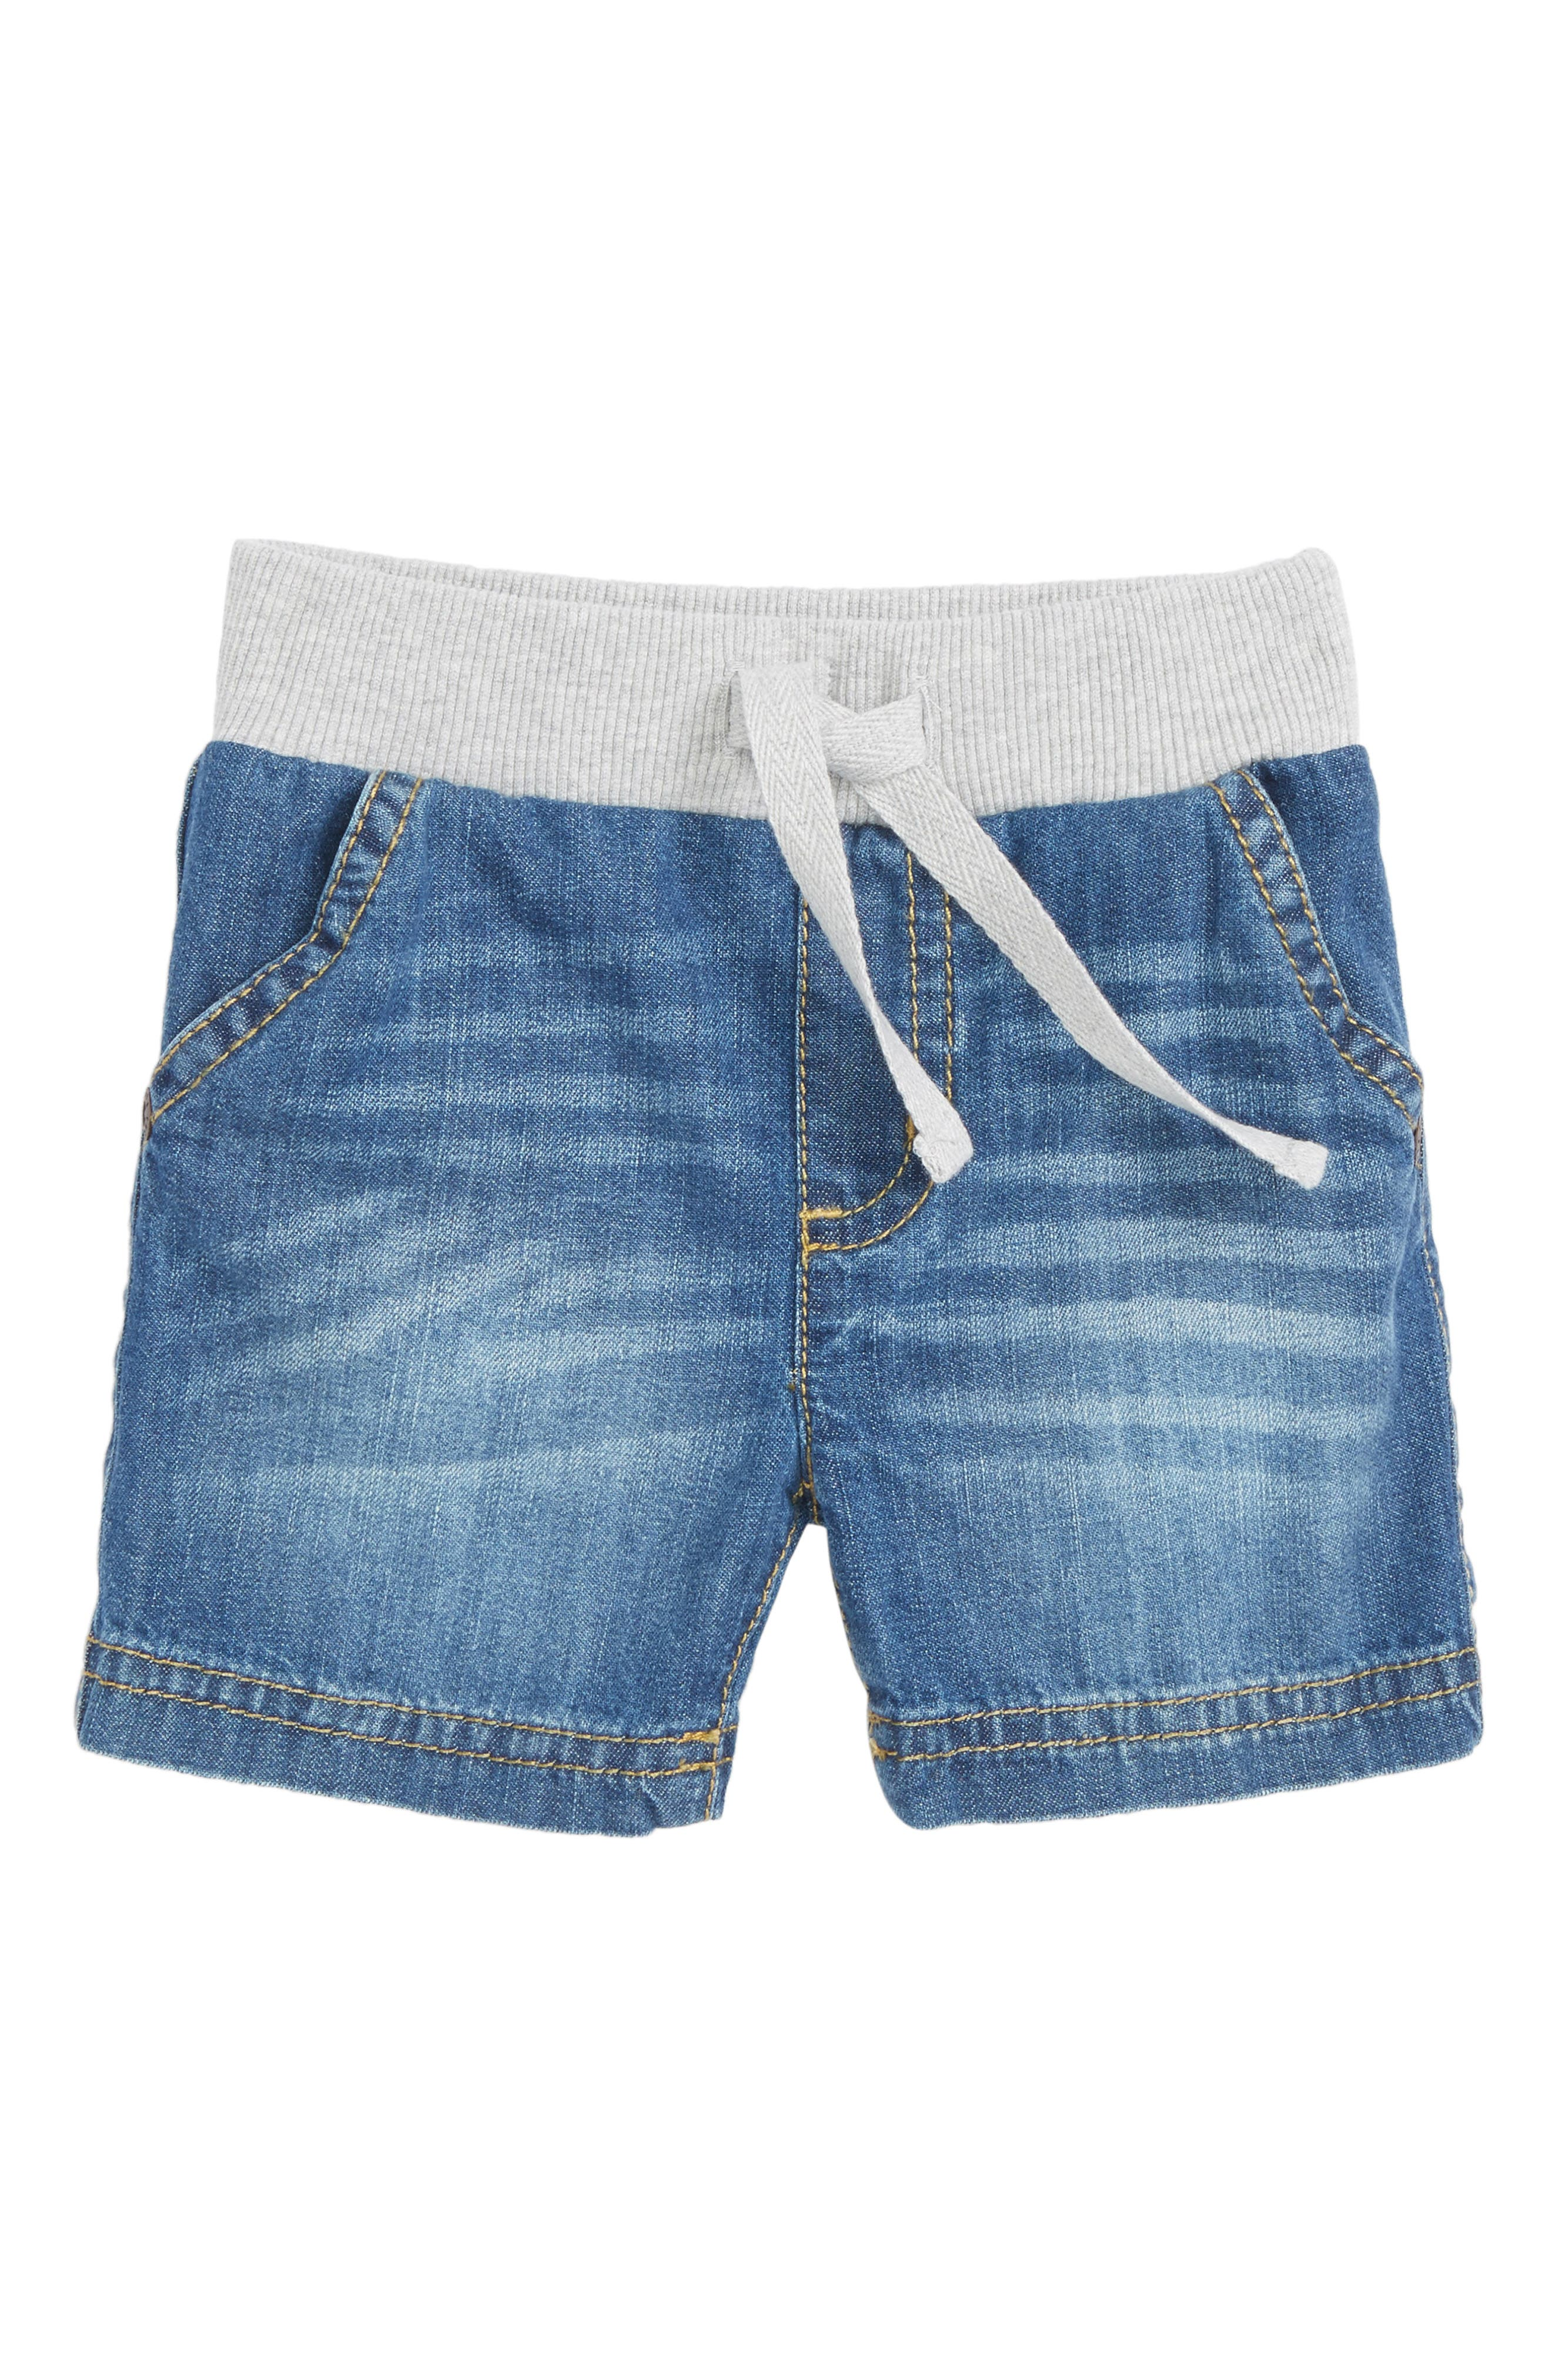 Woven Cotton Shorts,                         Main,                         color, 420